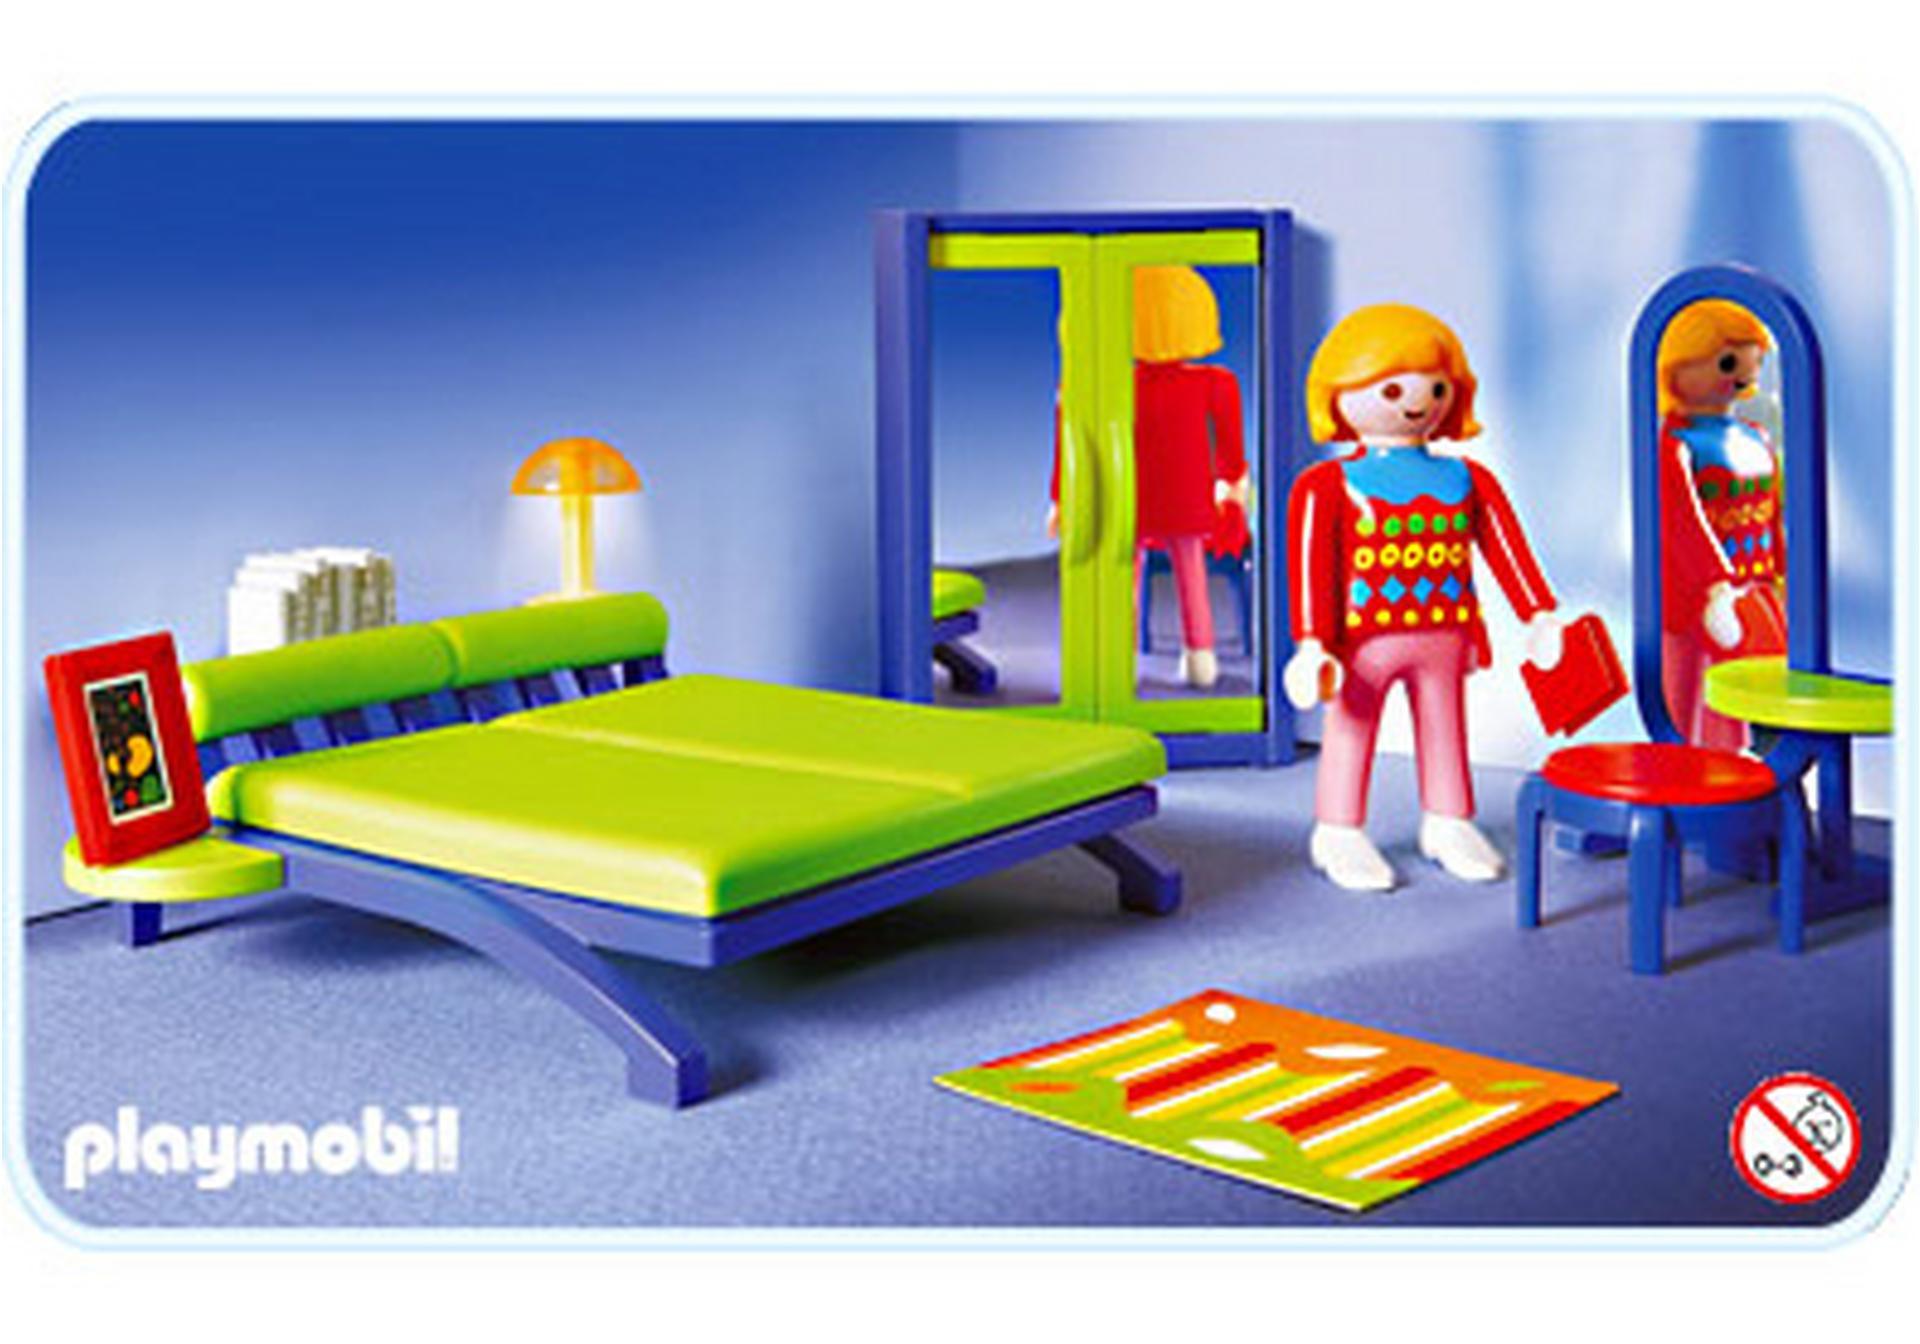 Chambre contemporaine 3967 a playmobil france for Playmobil chambre parents